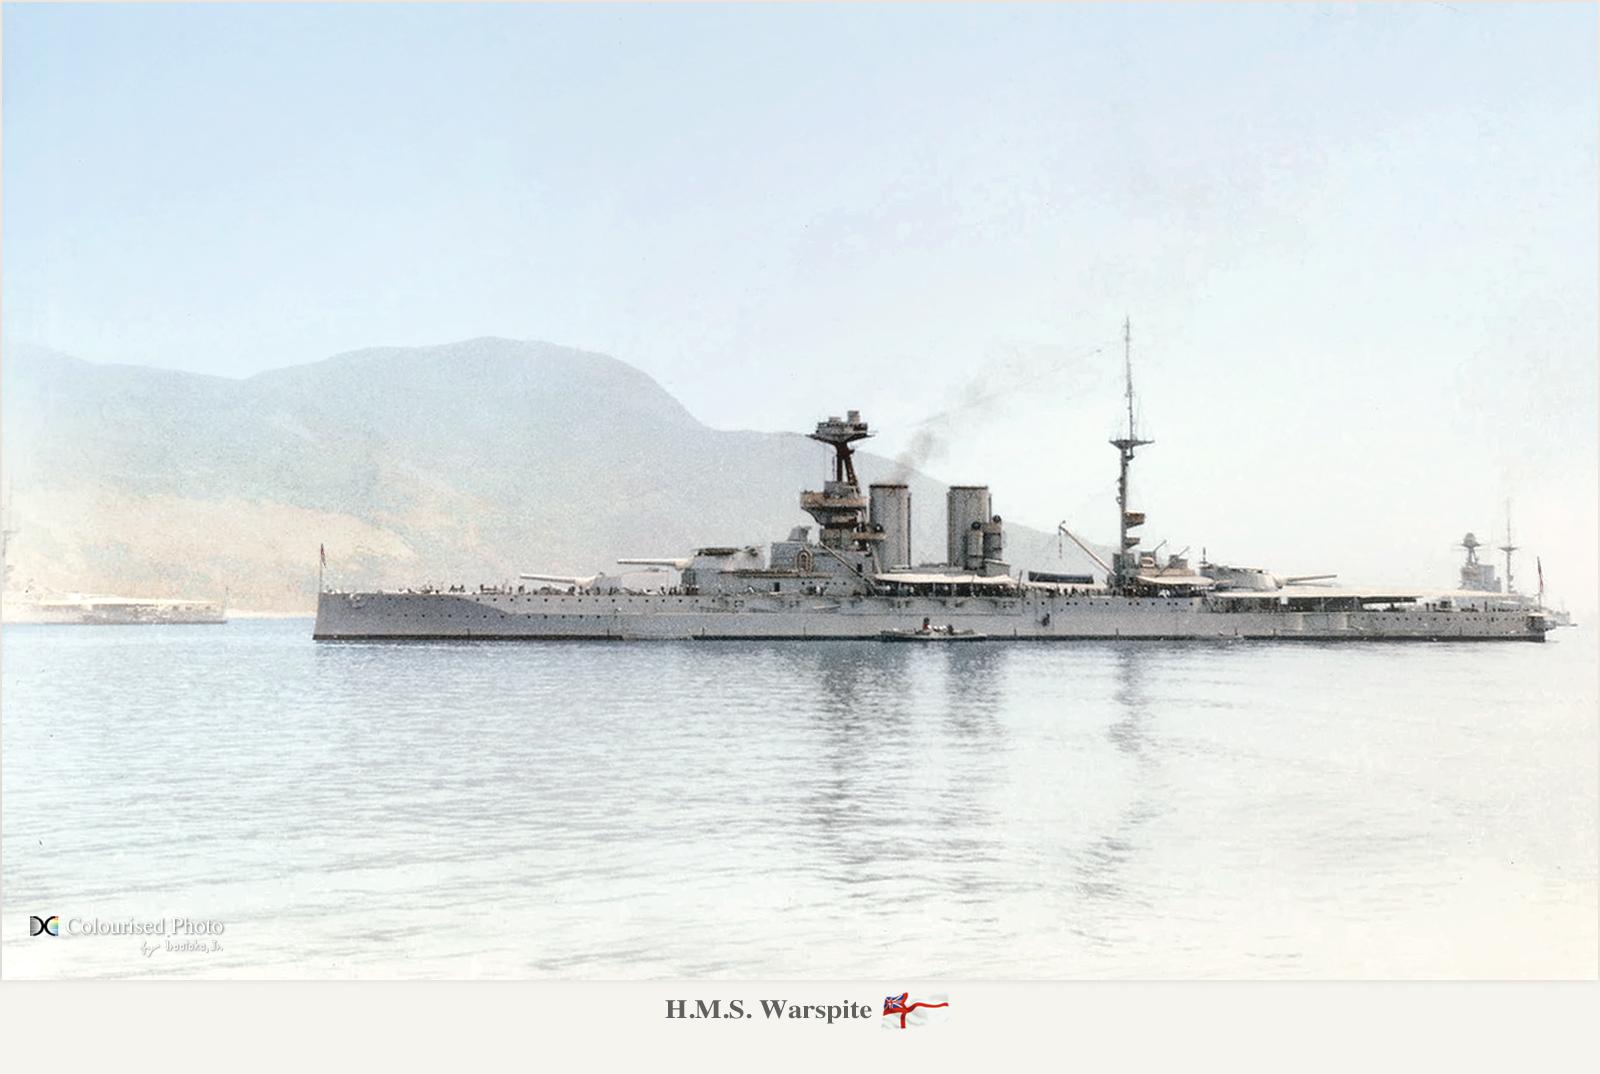 HMS Warspite in the Mediterranean, 1919 - colorized by irootoko Jr.